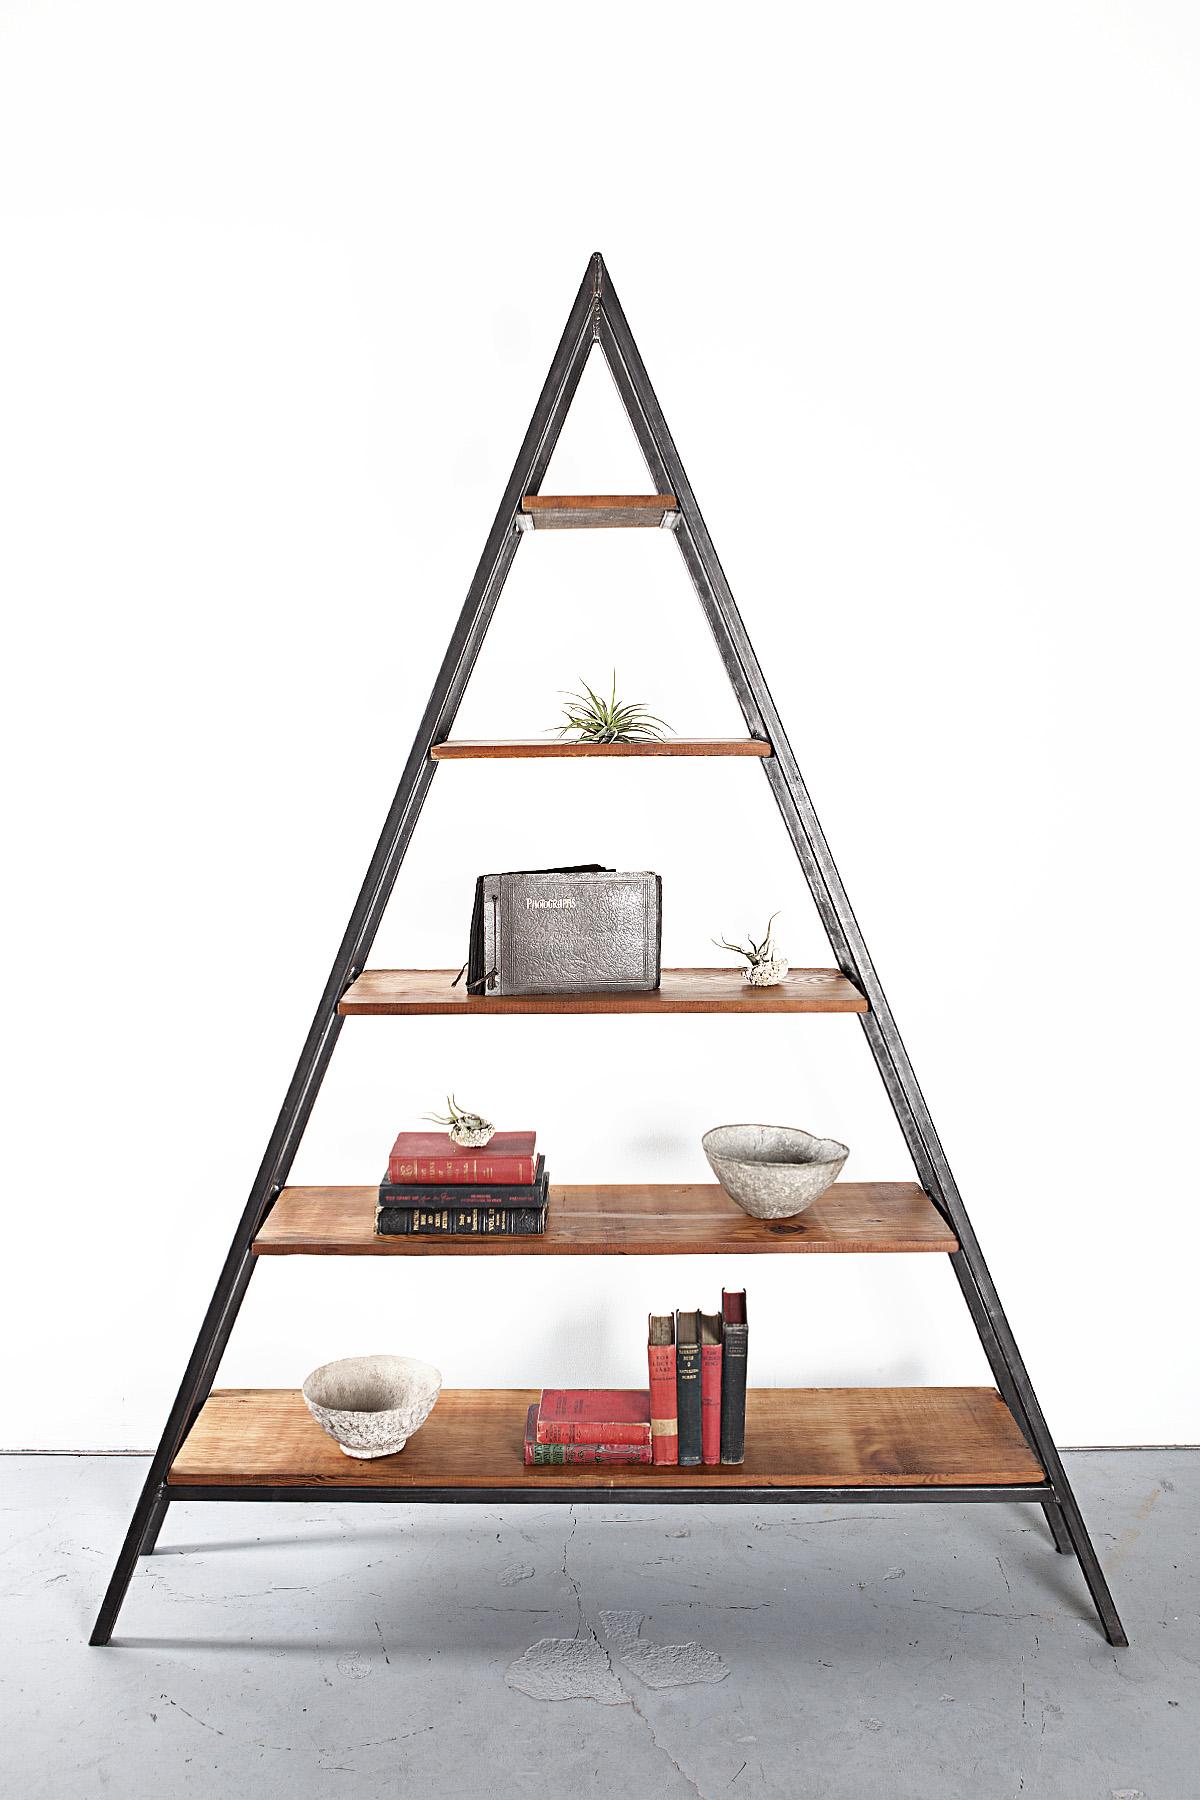 Custom Reclaimed Fir Triangle Shelf